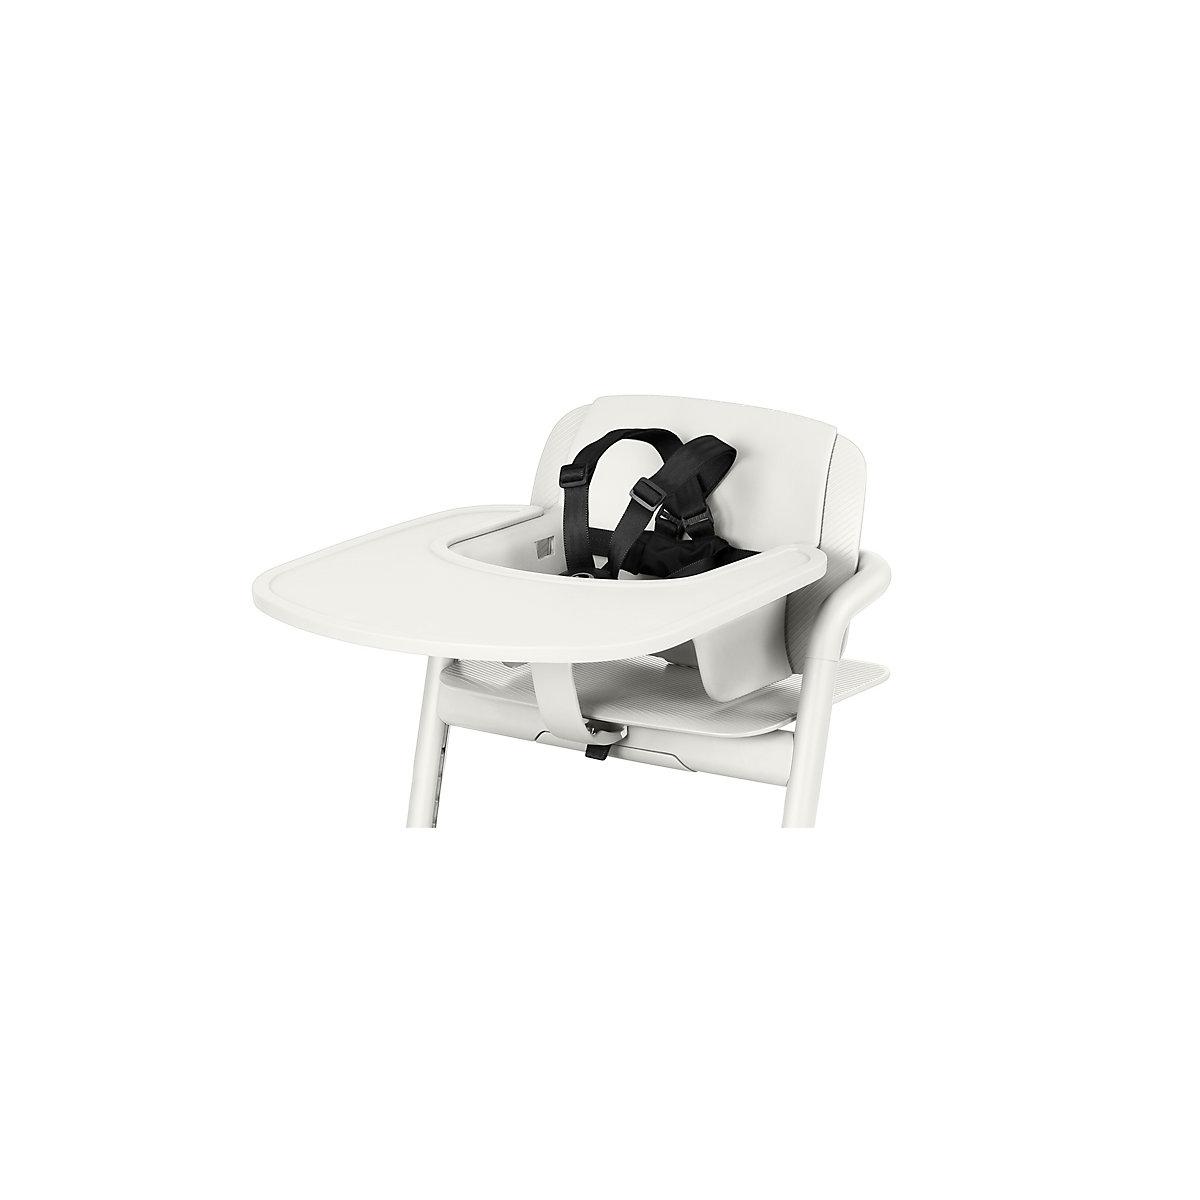 Cybex lemo porcelaine white tray